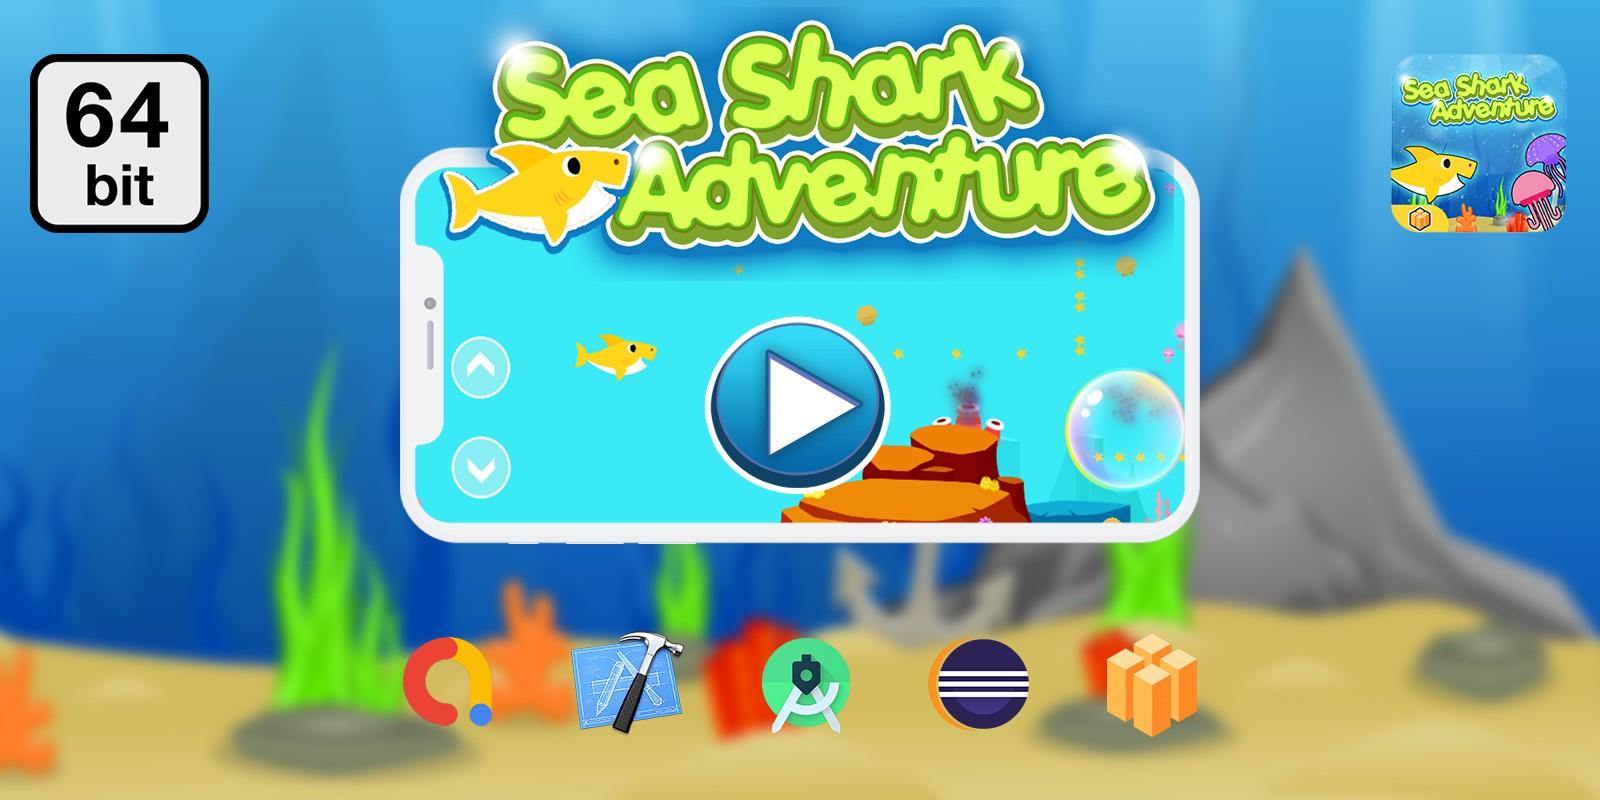 Sea Shark Adventur 64 bit - Buildbox Template